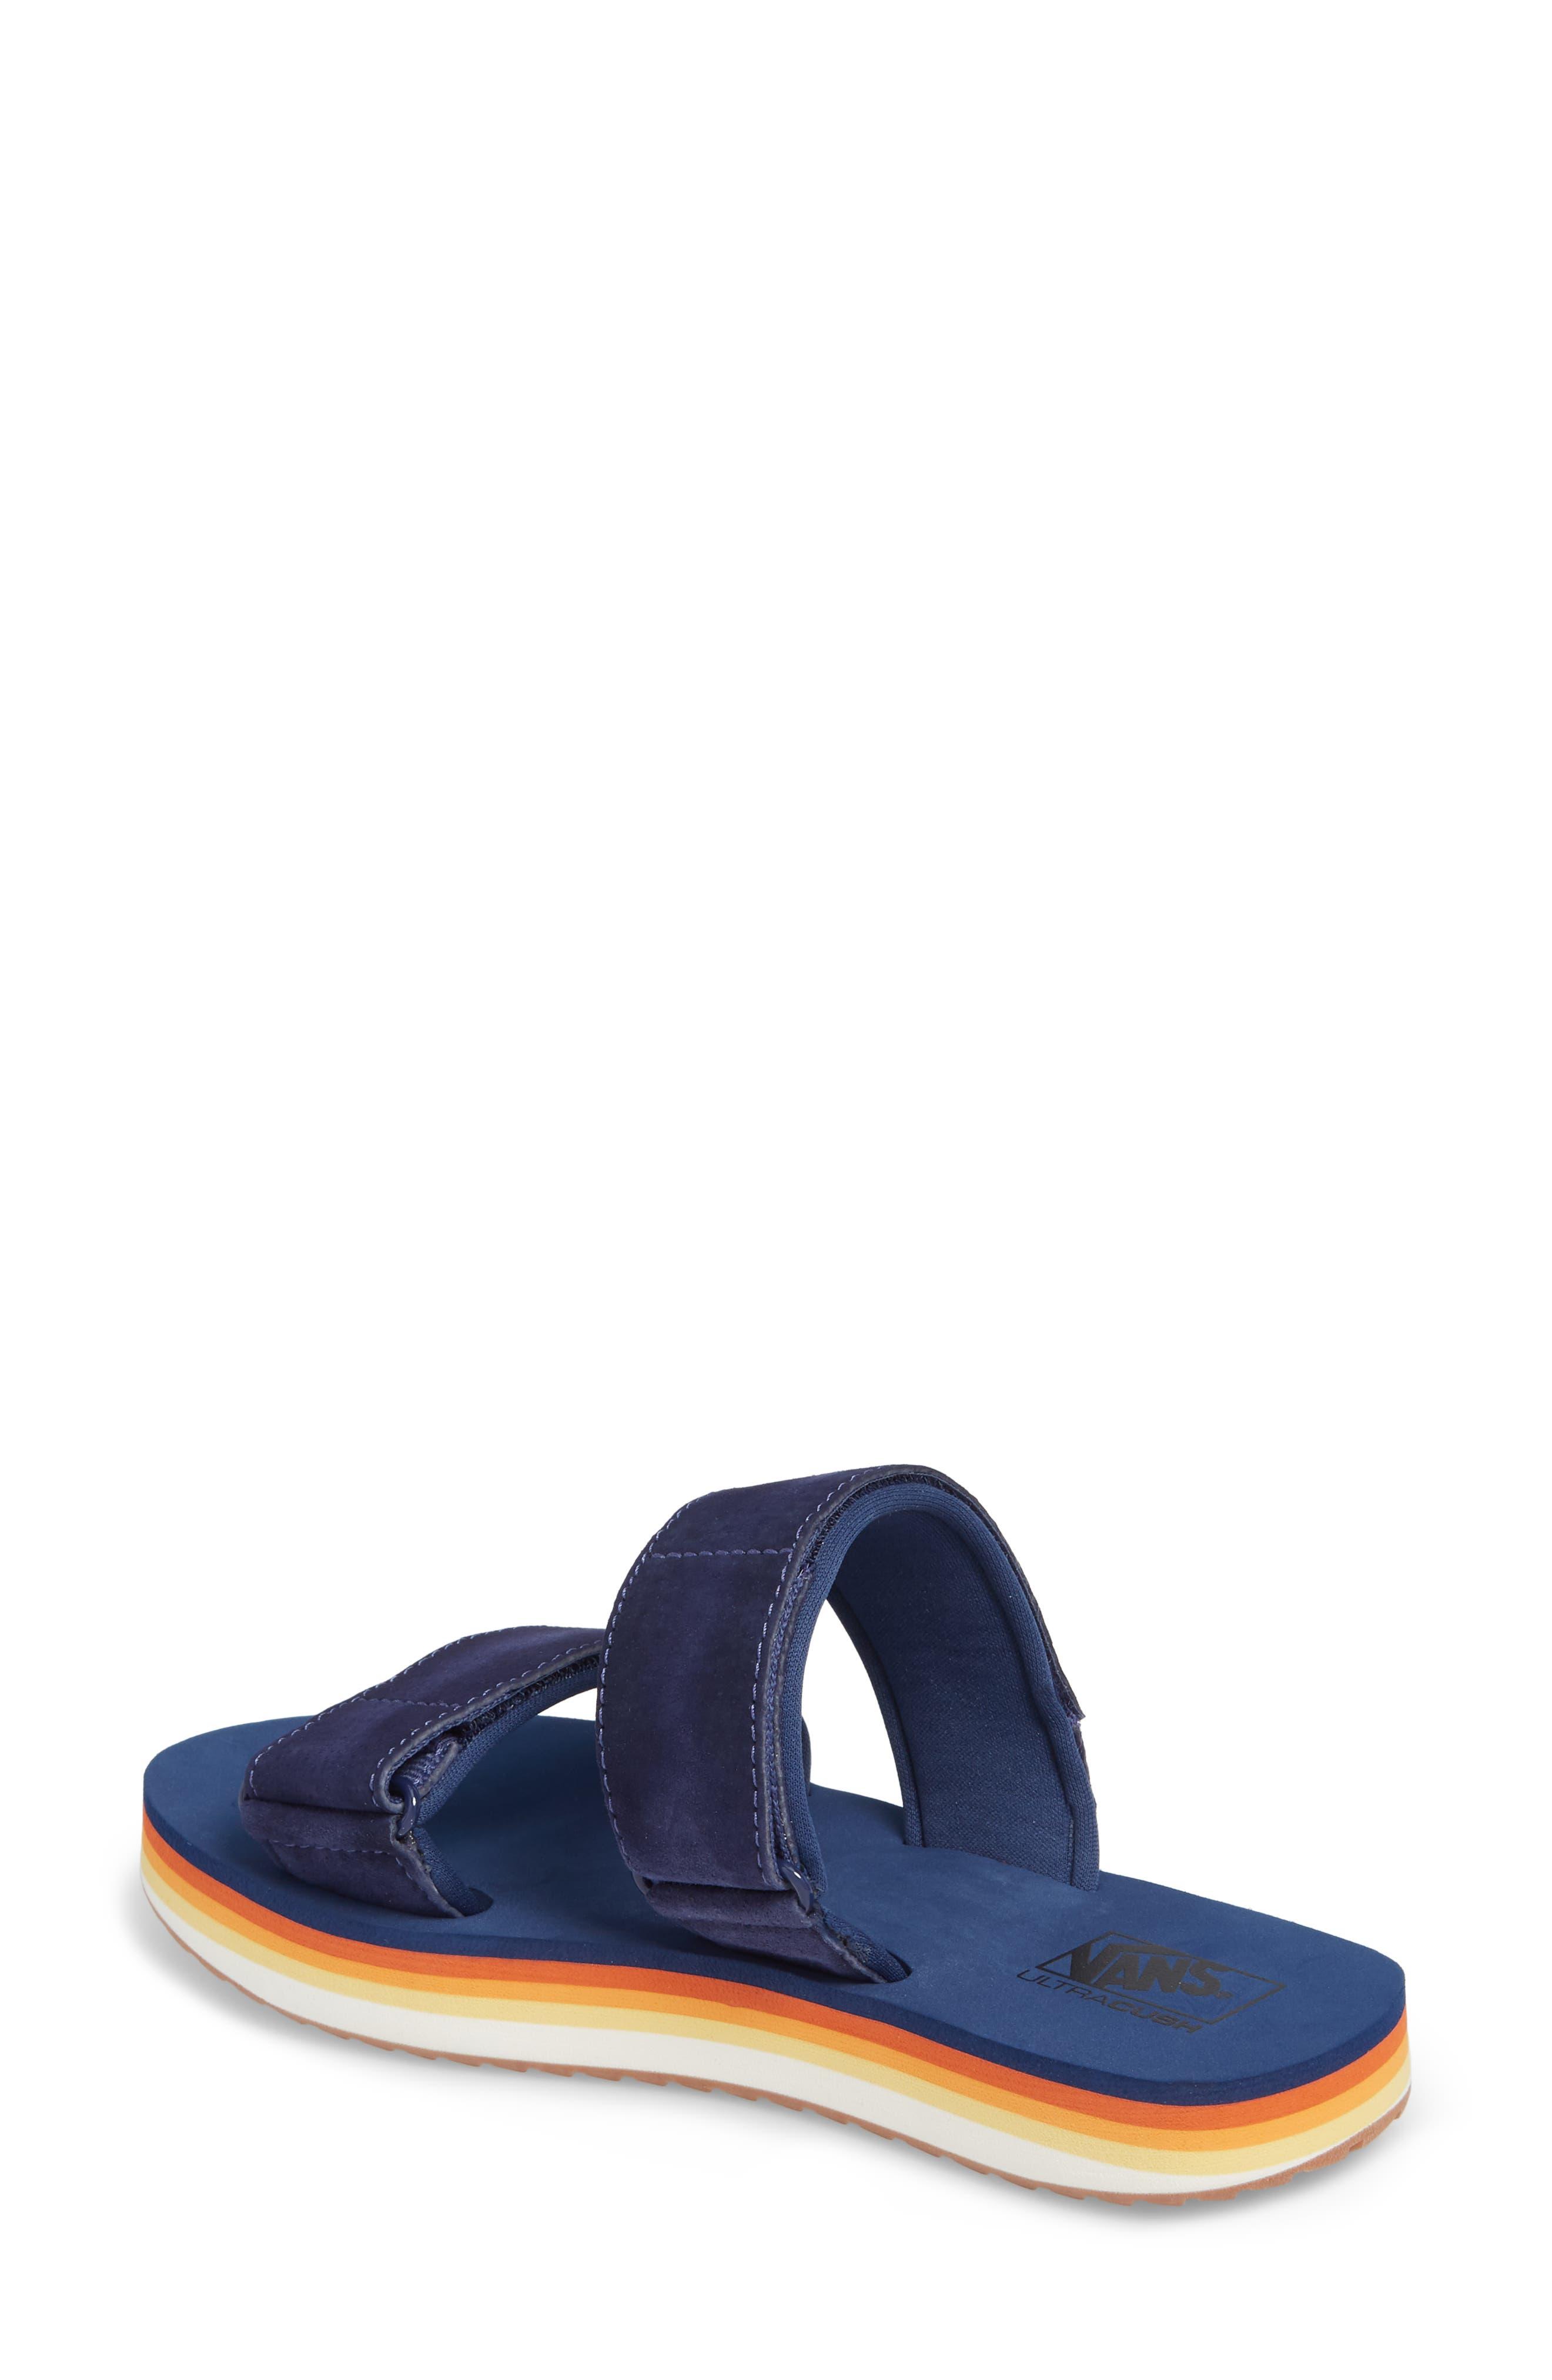 Cayucas Platform Slide Sandal,                             Alternate thumbnail 2, color,                             400